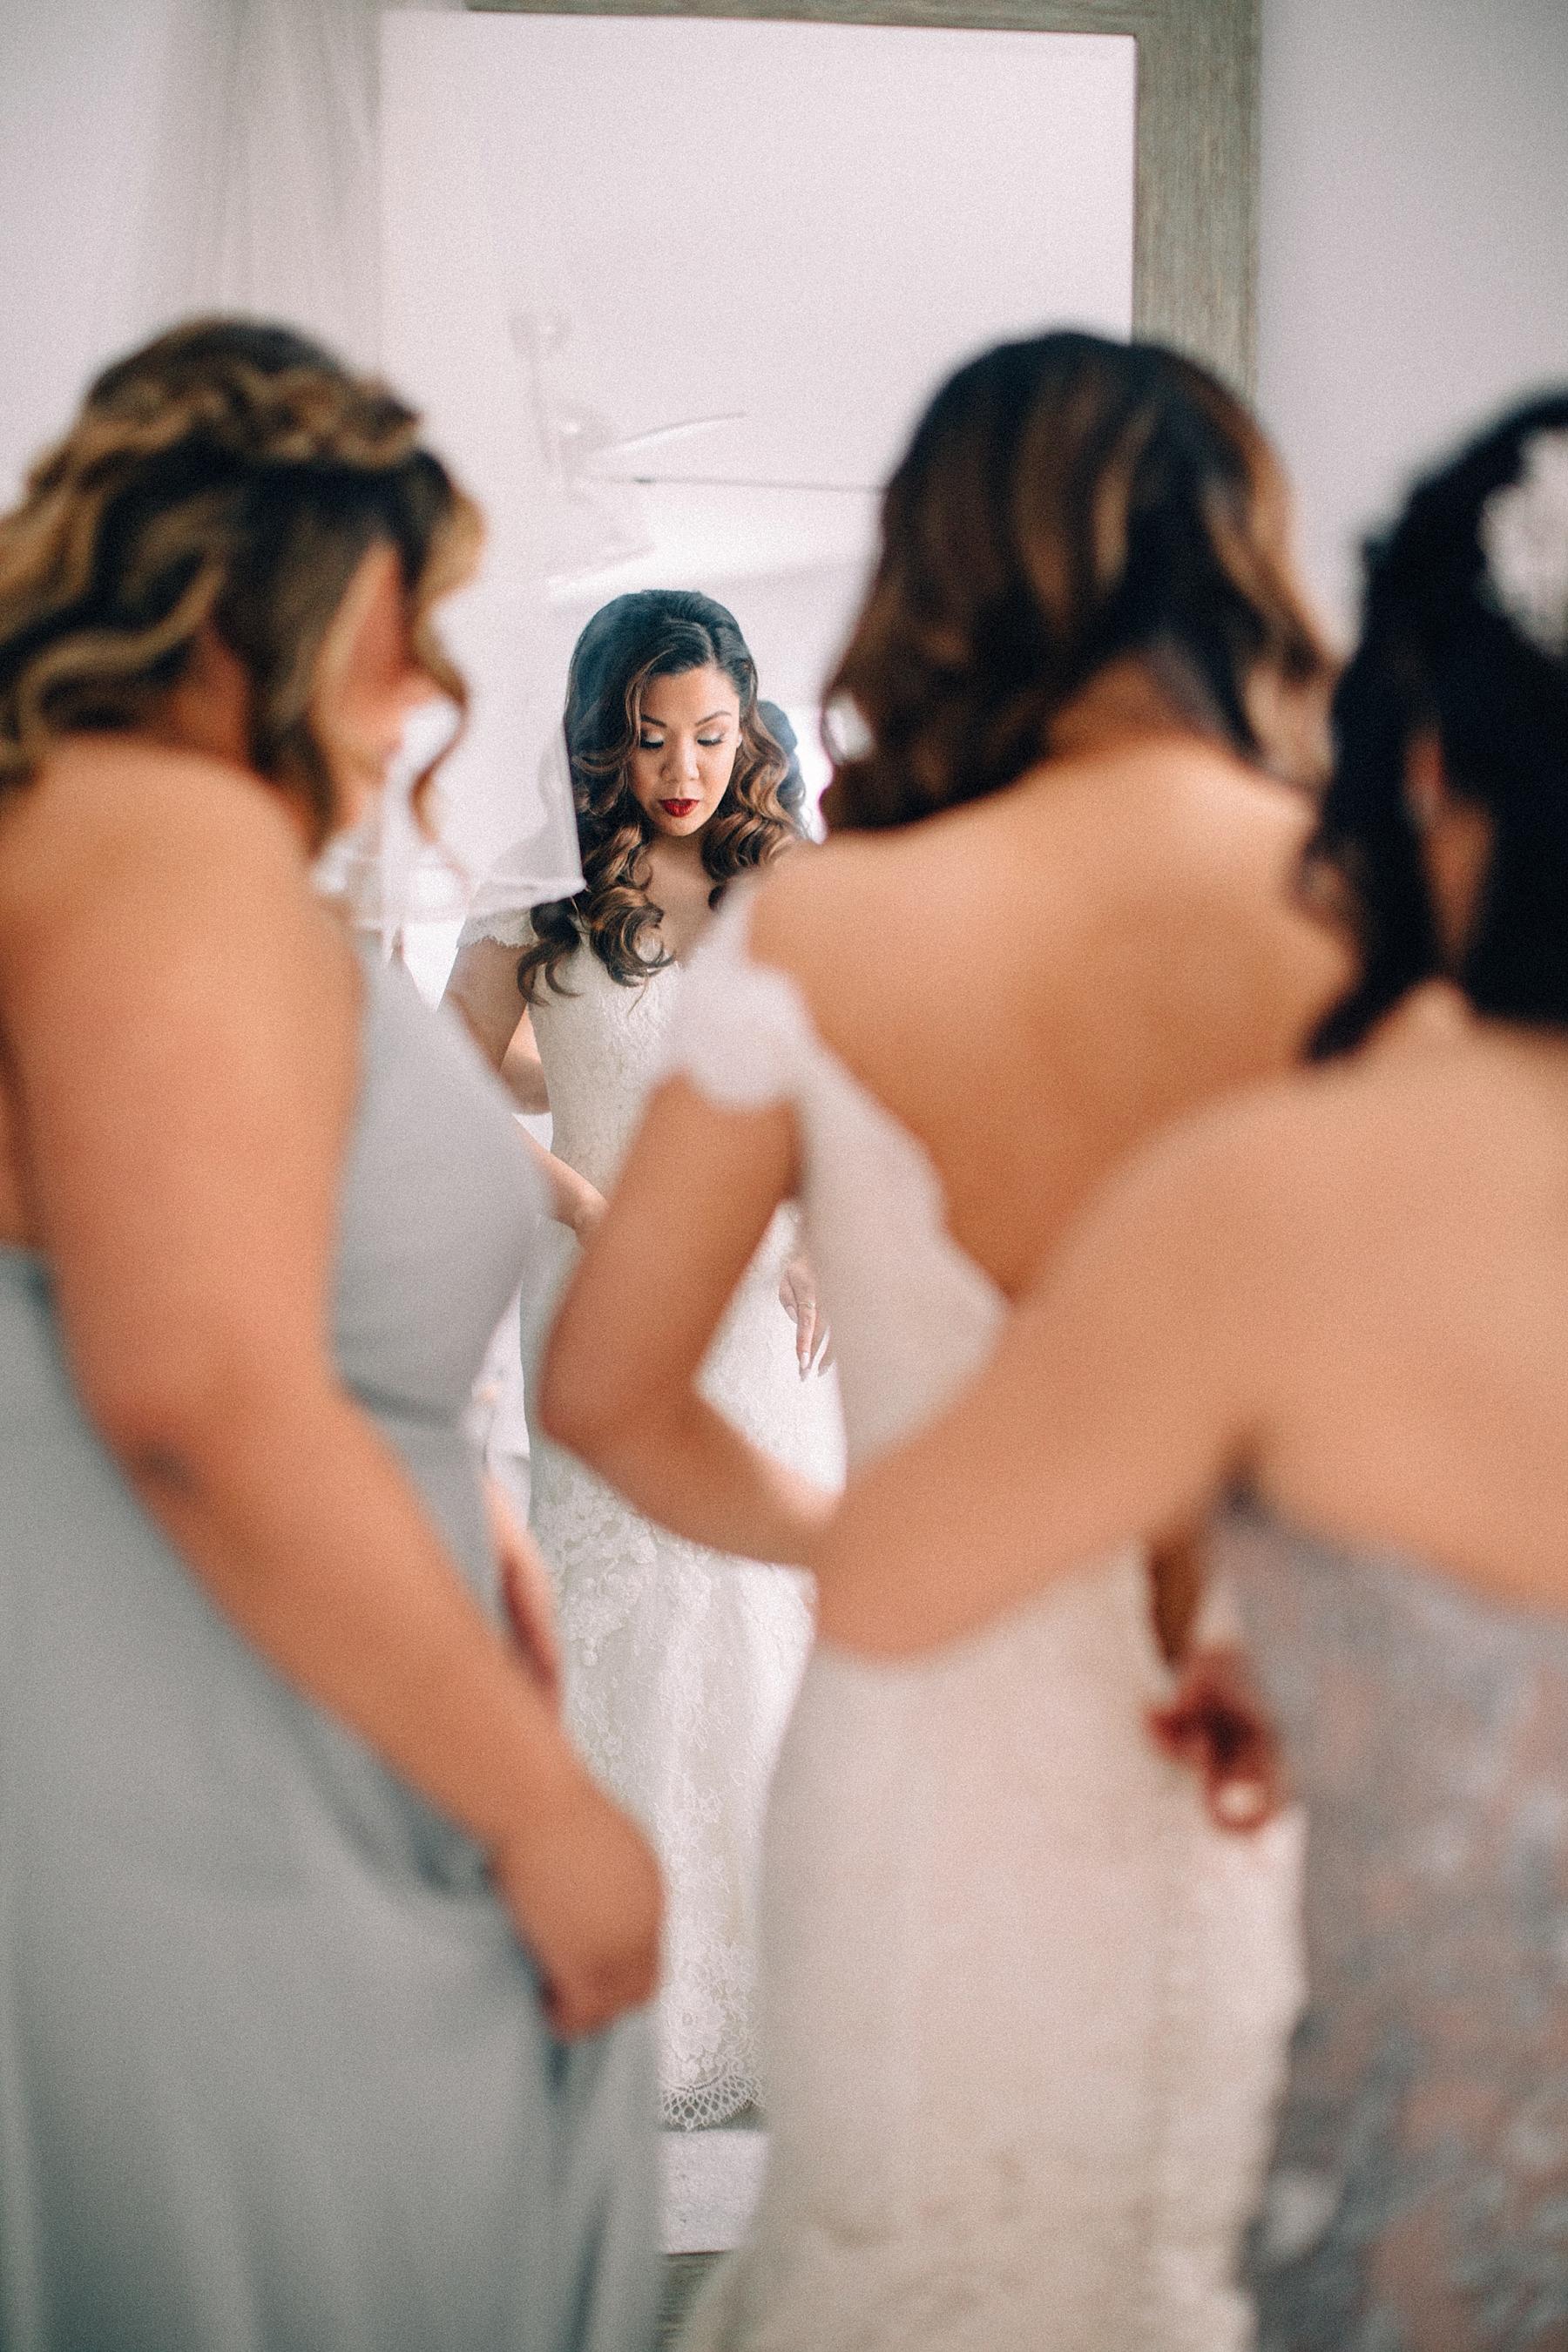 new_jersey_wedding_the_Berkeley_beach_asbury_photographer_0058.jpg